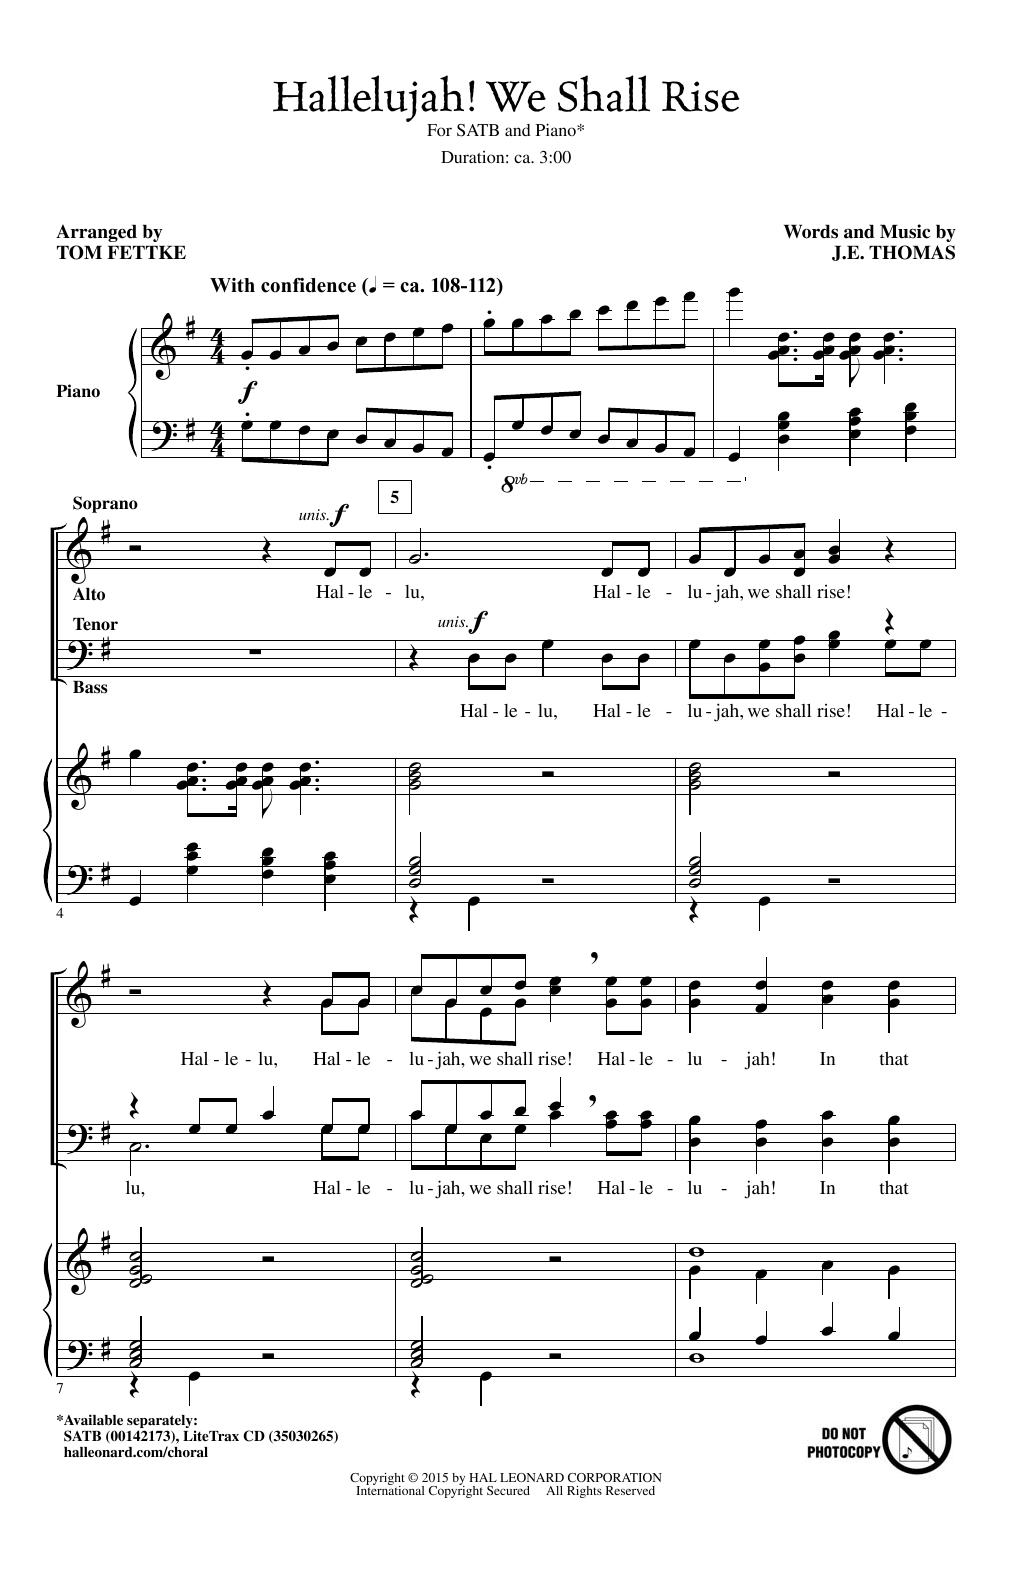 Grace Solo Amazing Tenor Music Sheet Sax